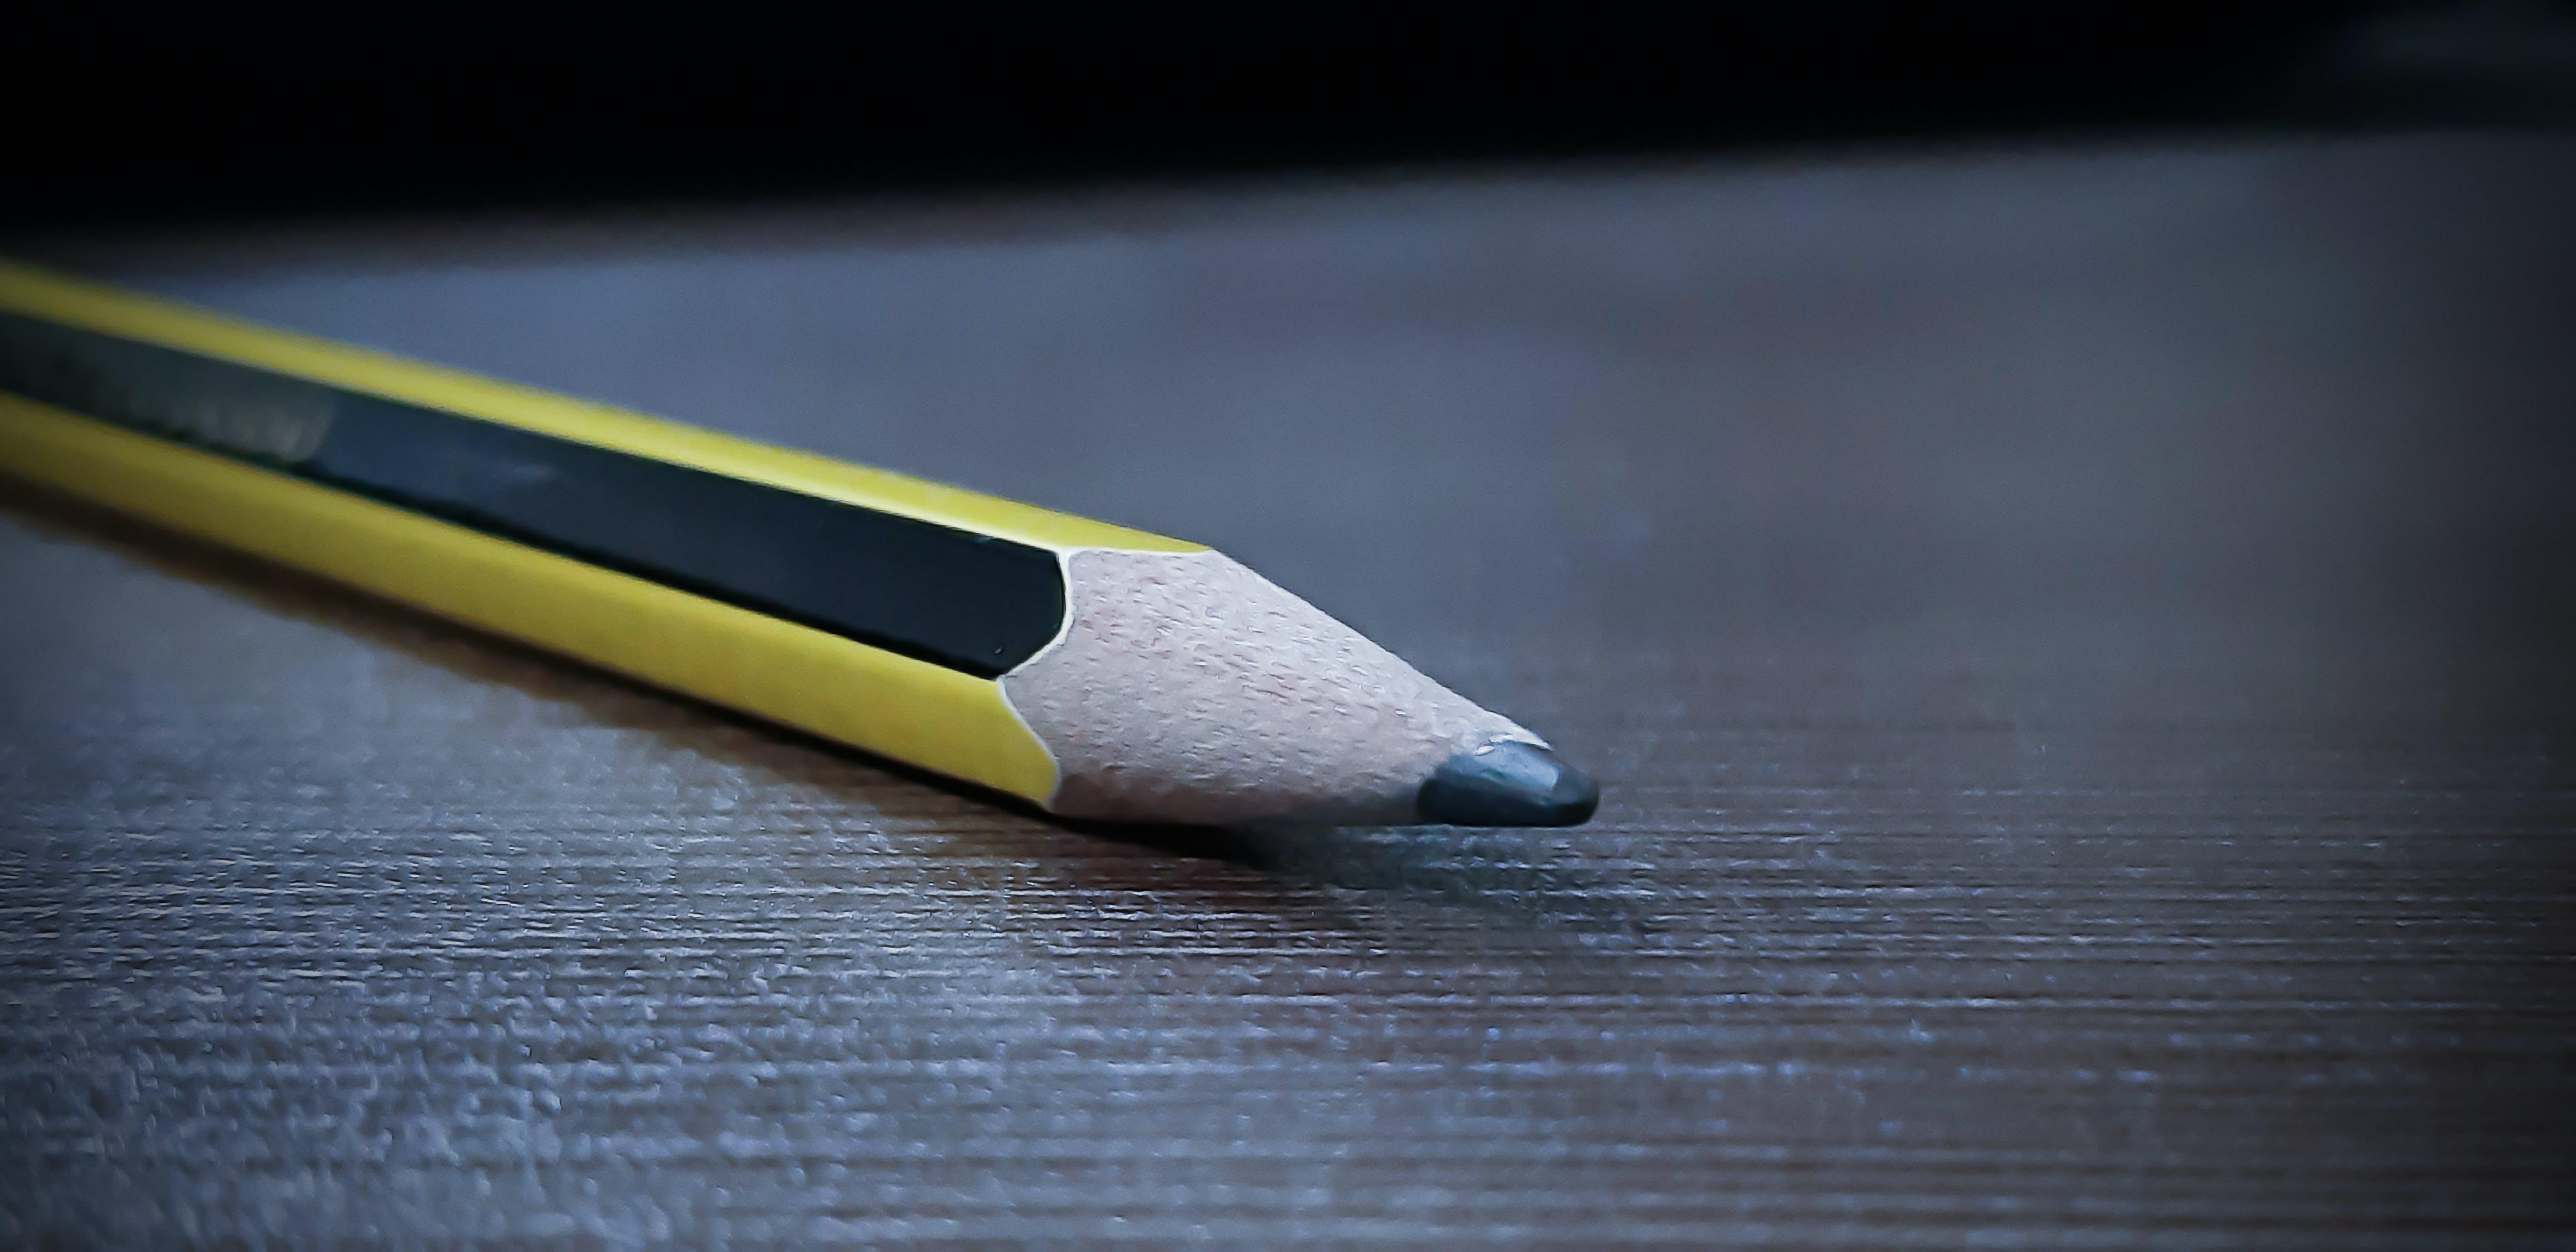 Free stock photo of lead pencil, pencil, sketching, vintage